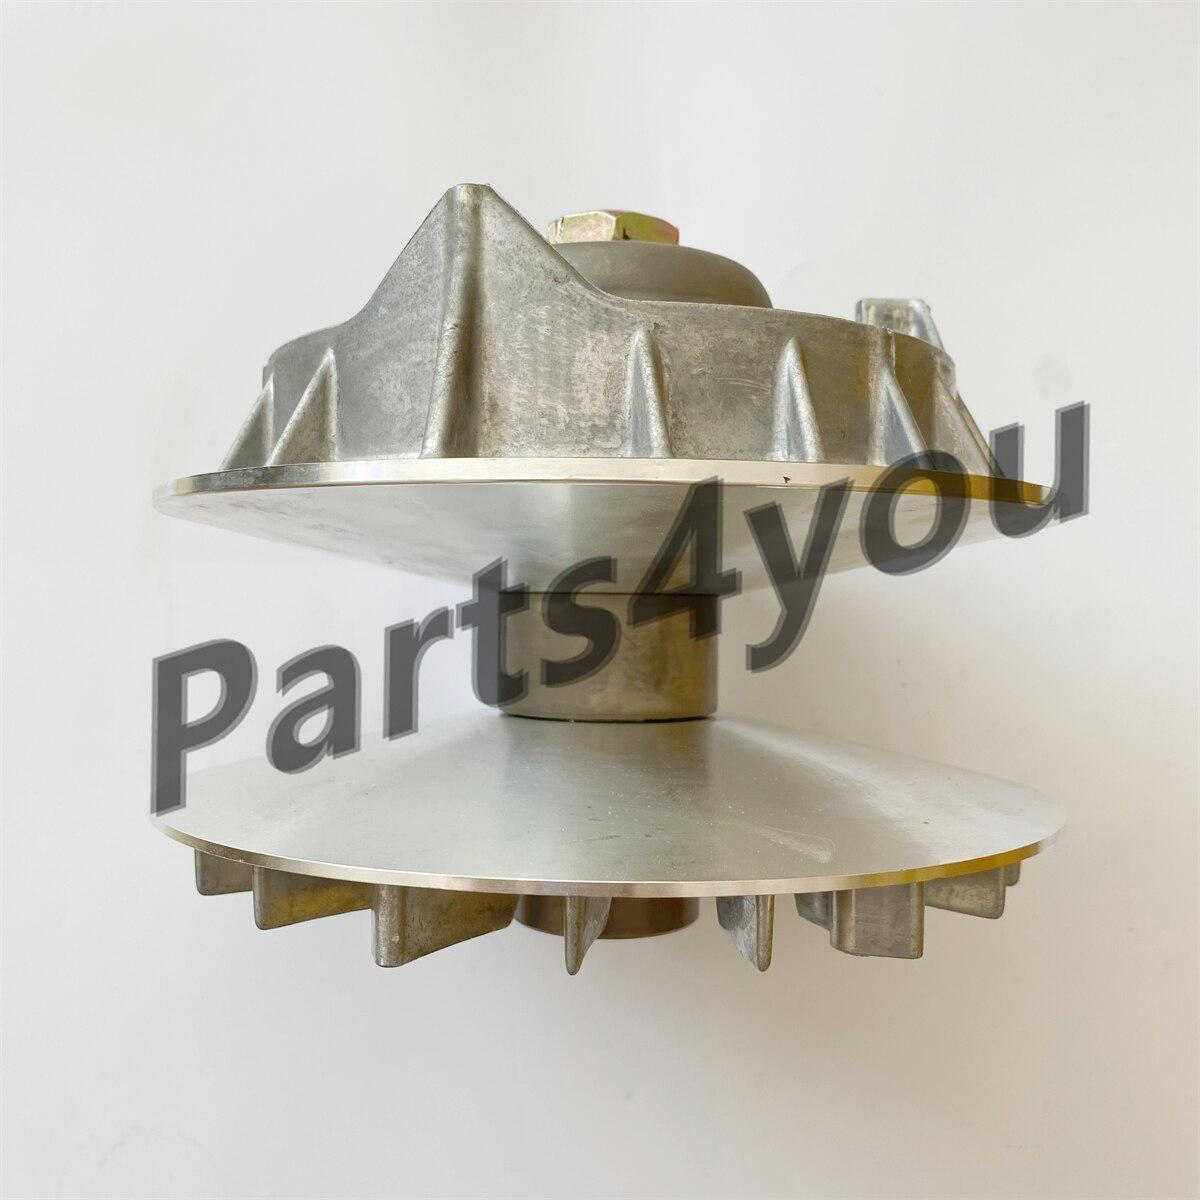 Primary Clutch Drive Clutch for Hisun 800cc 800 HS800 ATV UTV HS800 800 HS UTV Strike Spire Massimo Benneche 21300-010-0001 enlarge